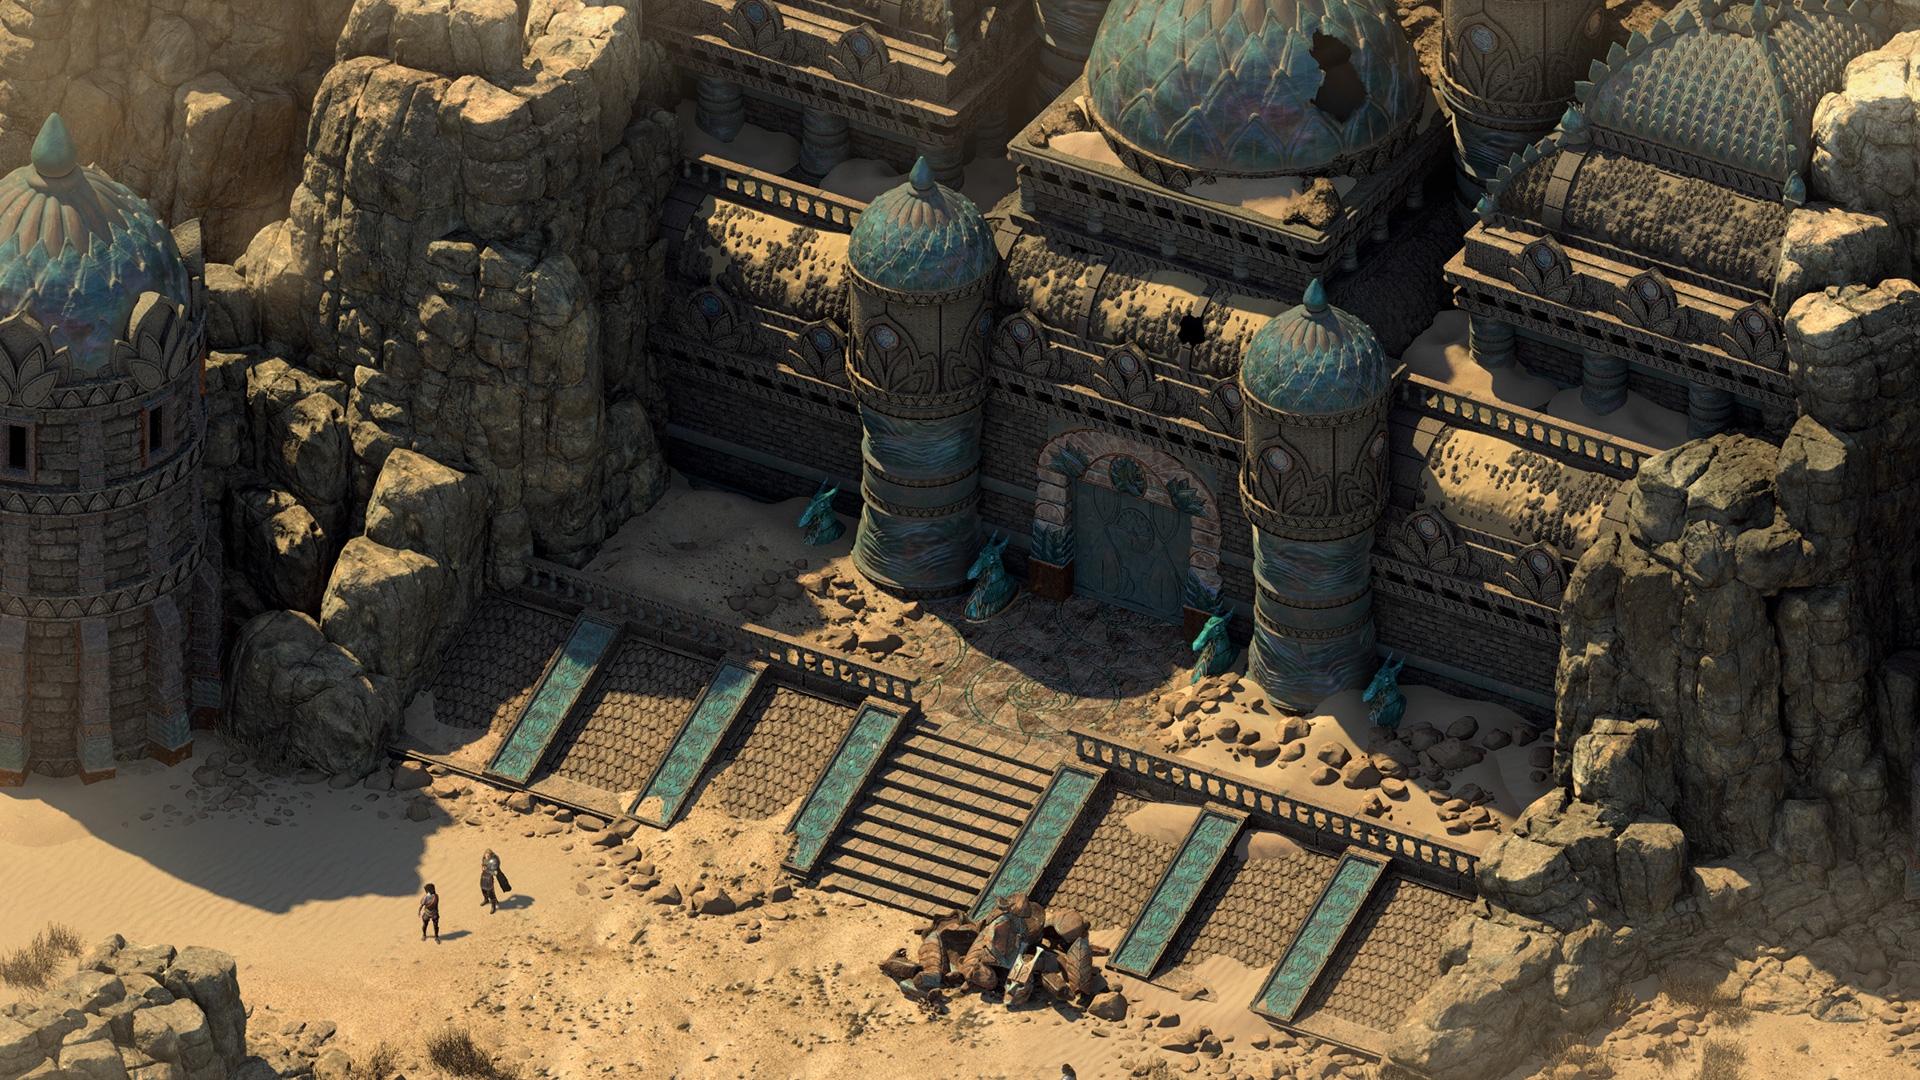 Опубликованы оценки Pillars of Eternity 2: Deadfire — по-прежнему великолепно